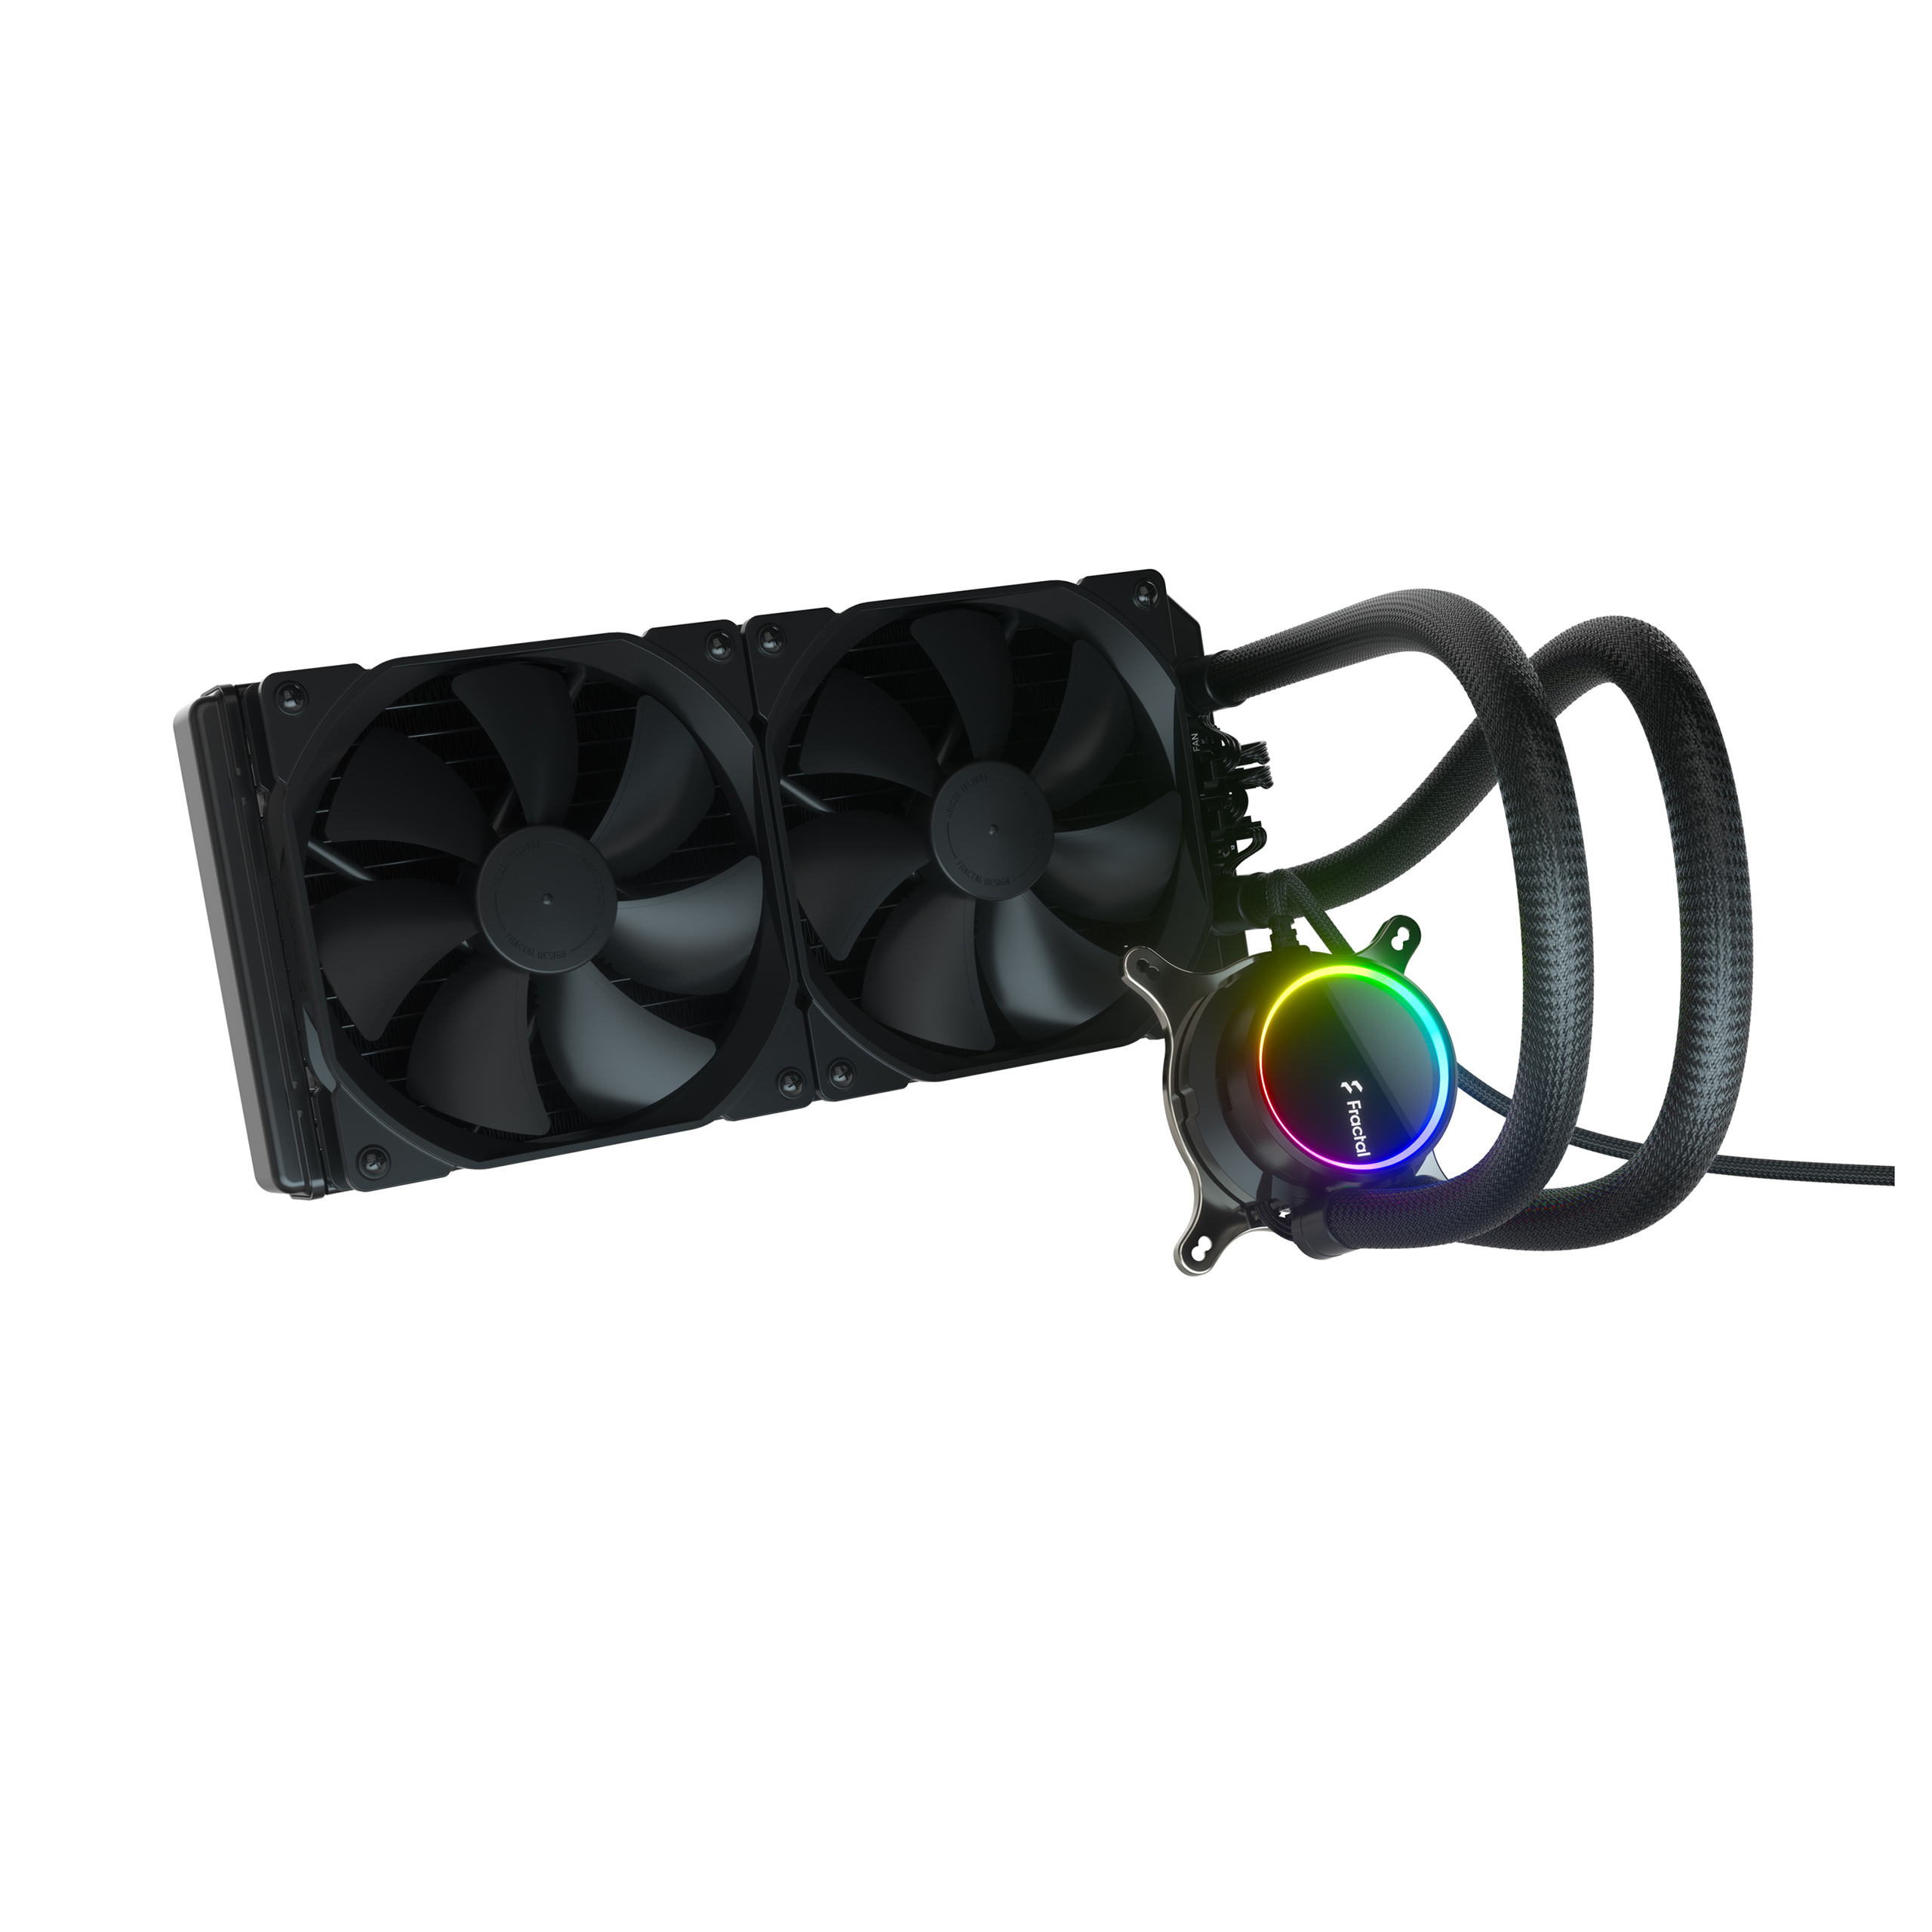 Celsius+ S28 Dynamic - RGB - 280 mm